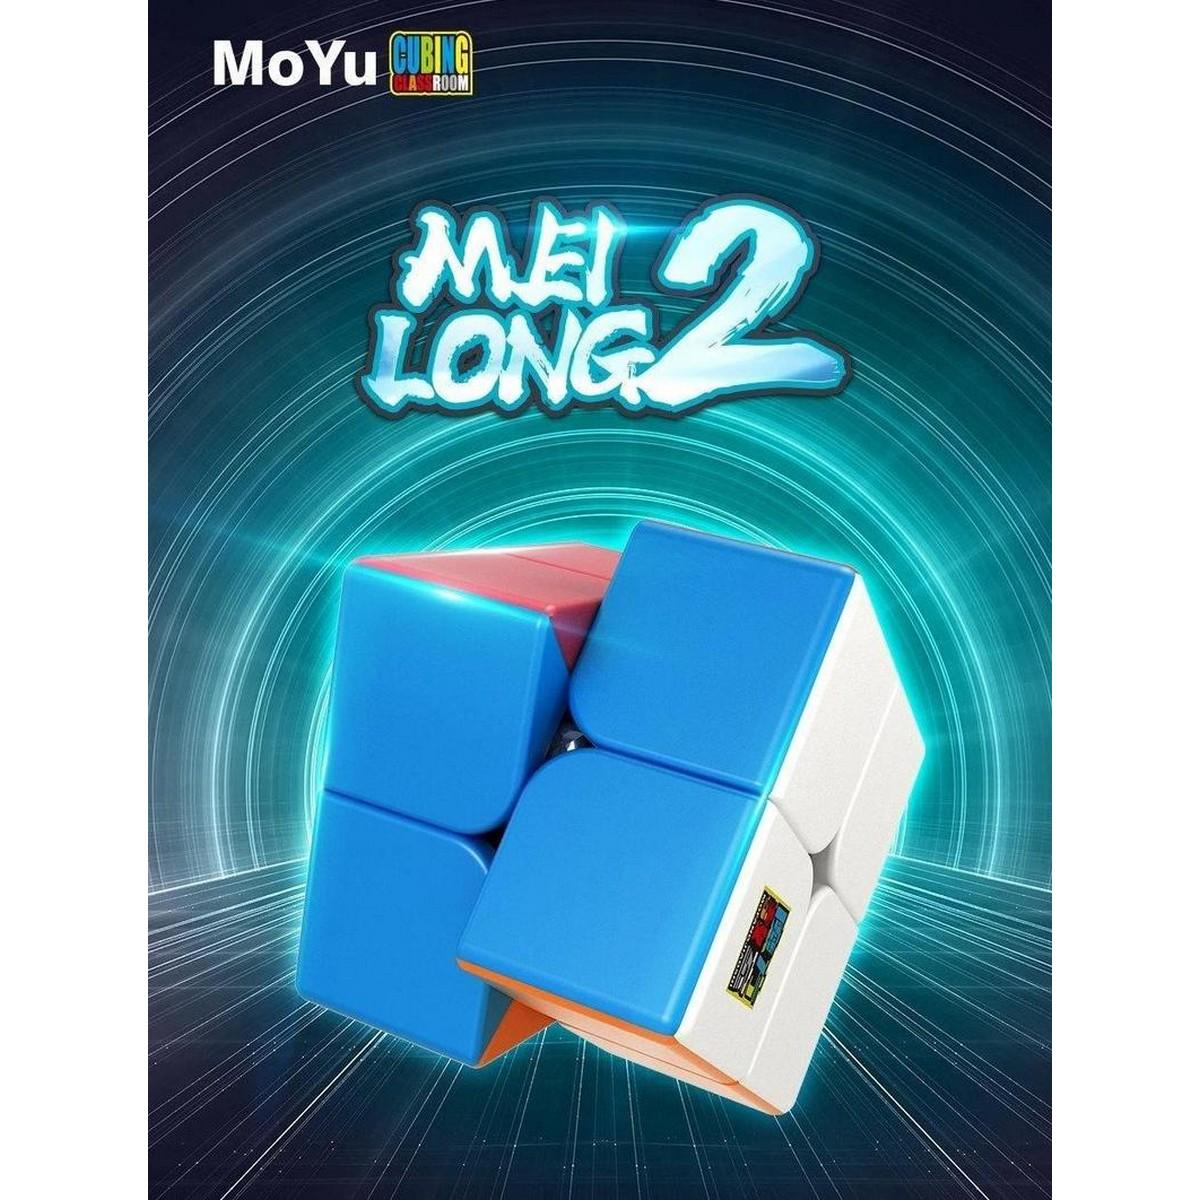 Rubik's Cube MoYu 2x2 Multicolor Mind Puzzle Rubik's Magic Cube 100% Sticker less 2x2x2